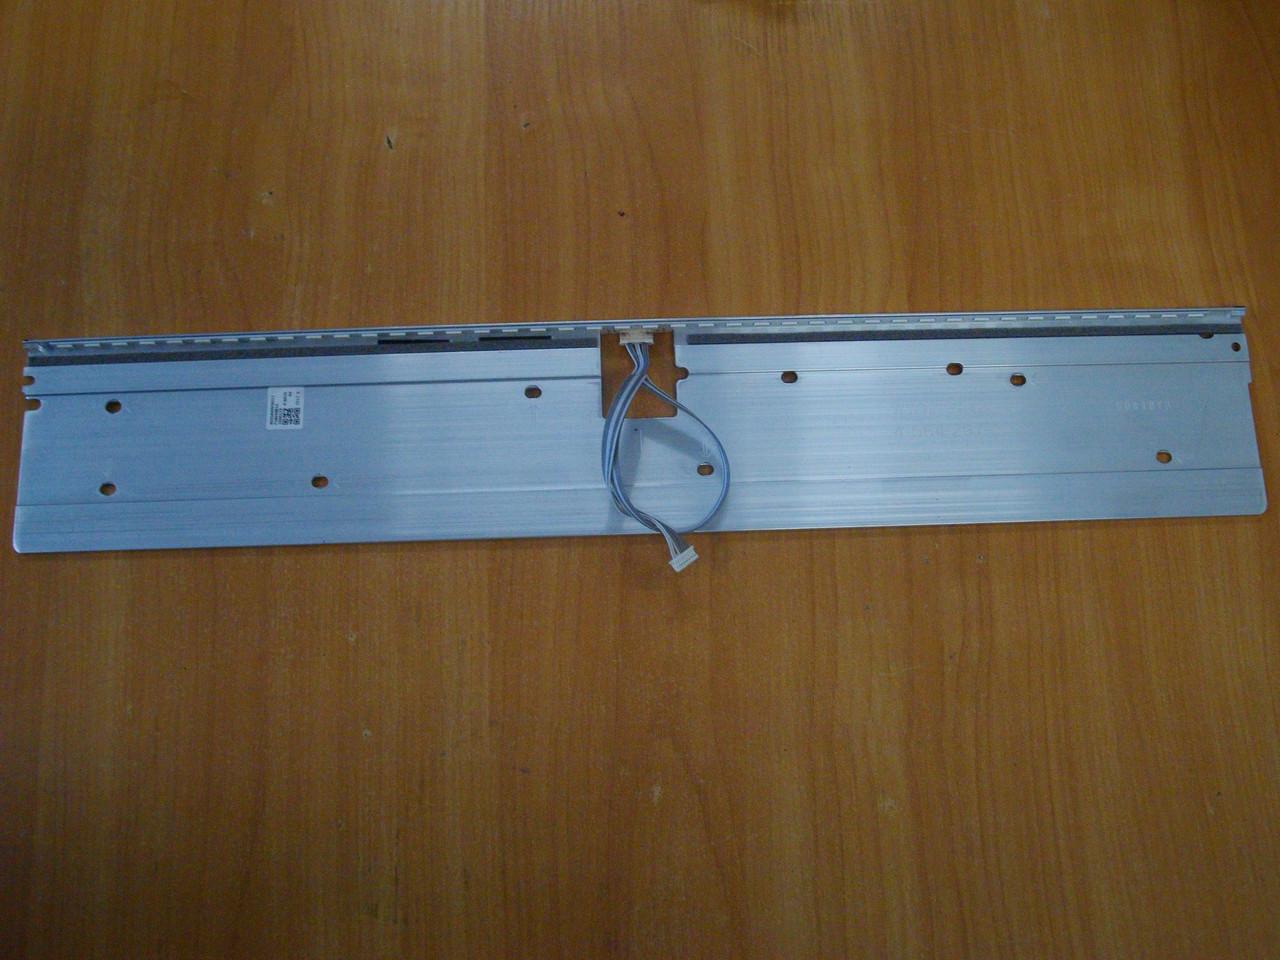 Светодиодная линейка LED для телевизора Sony KDL-40W705C, NS5S400VND11, F18699813, 2000129, 4-564-297, 50419YB